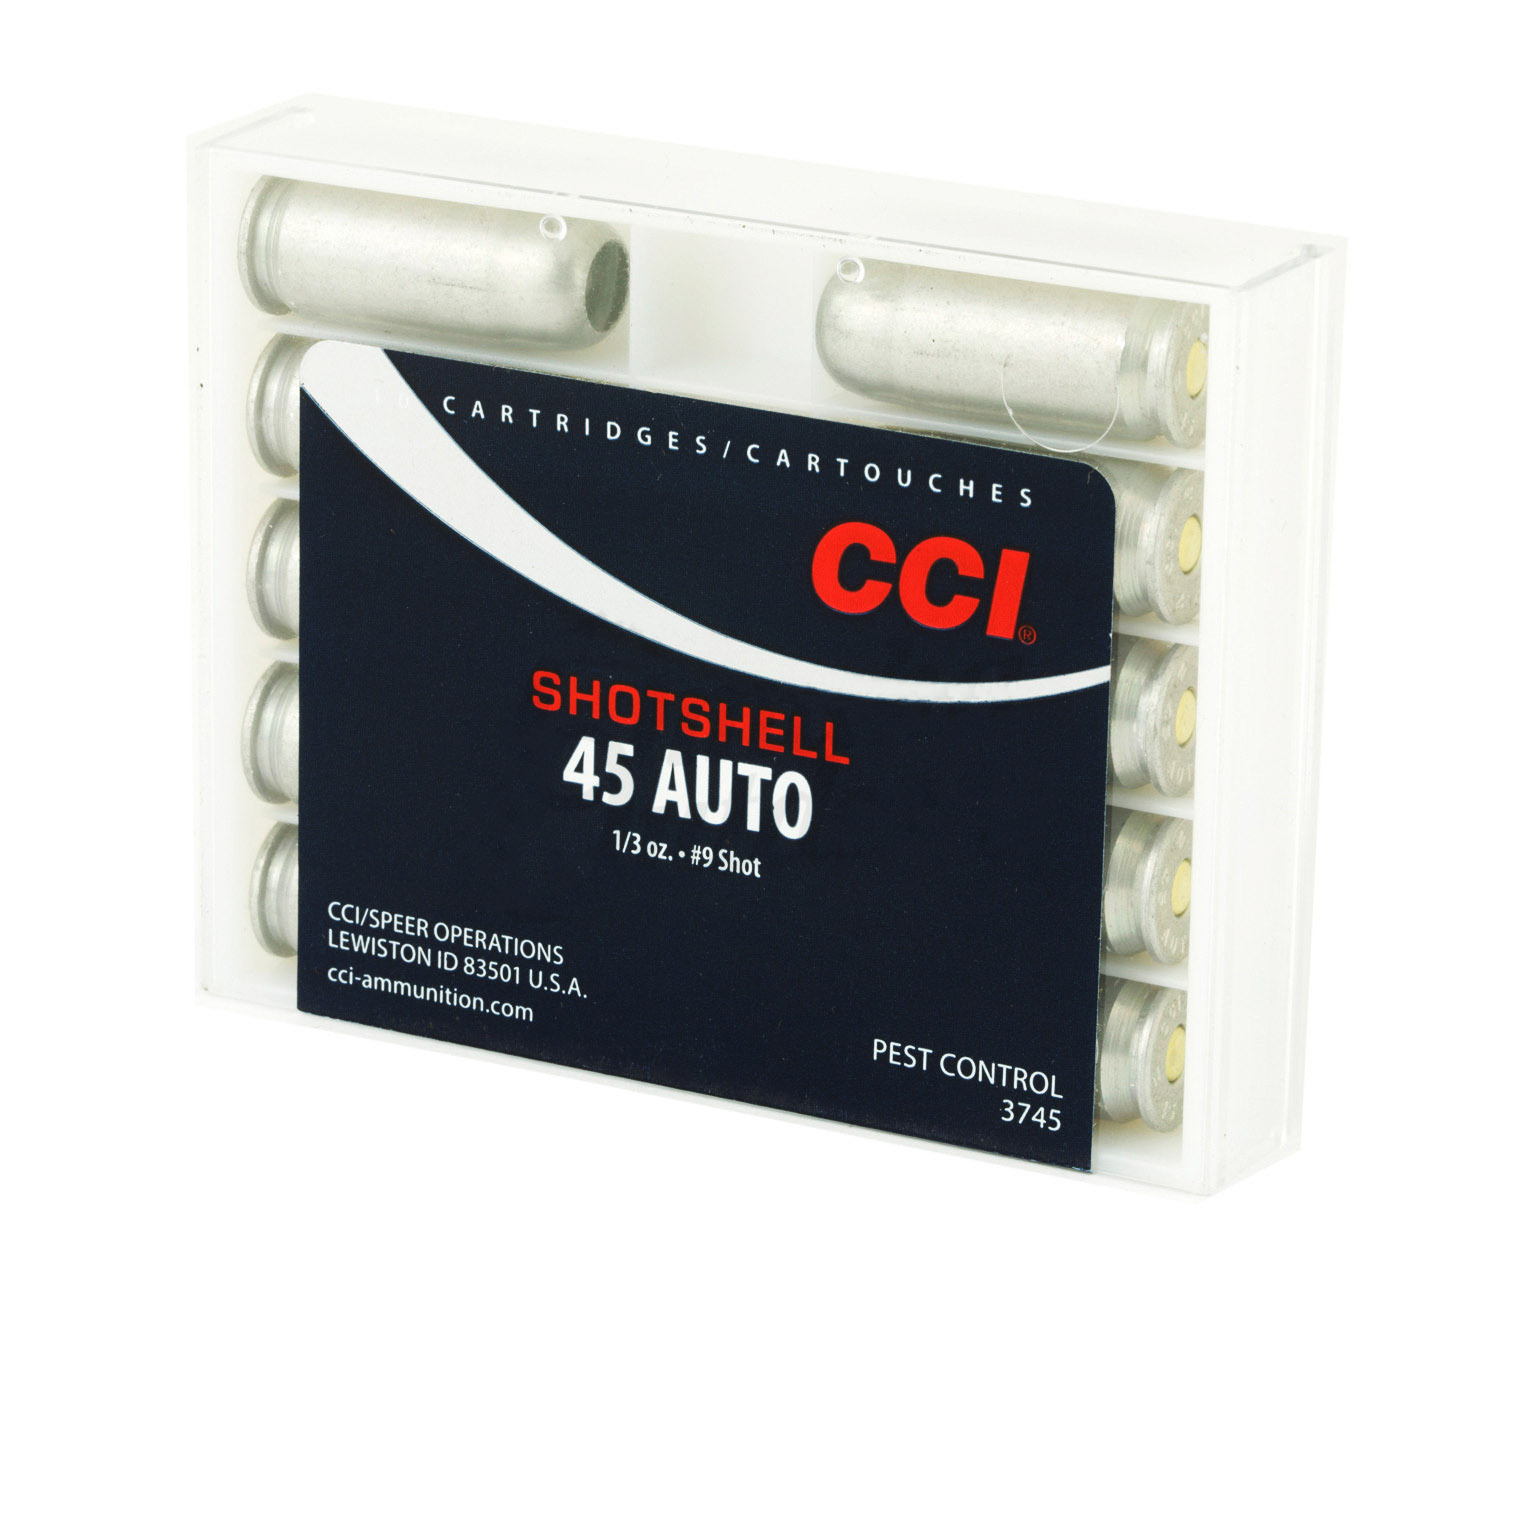 CCI Speer 45 ACP 117 Grain Shotshell Ammo, 10 Round Box - $12 20